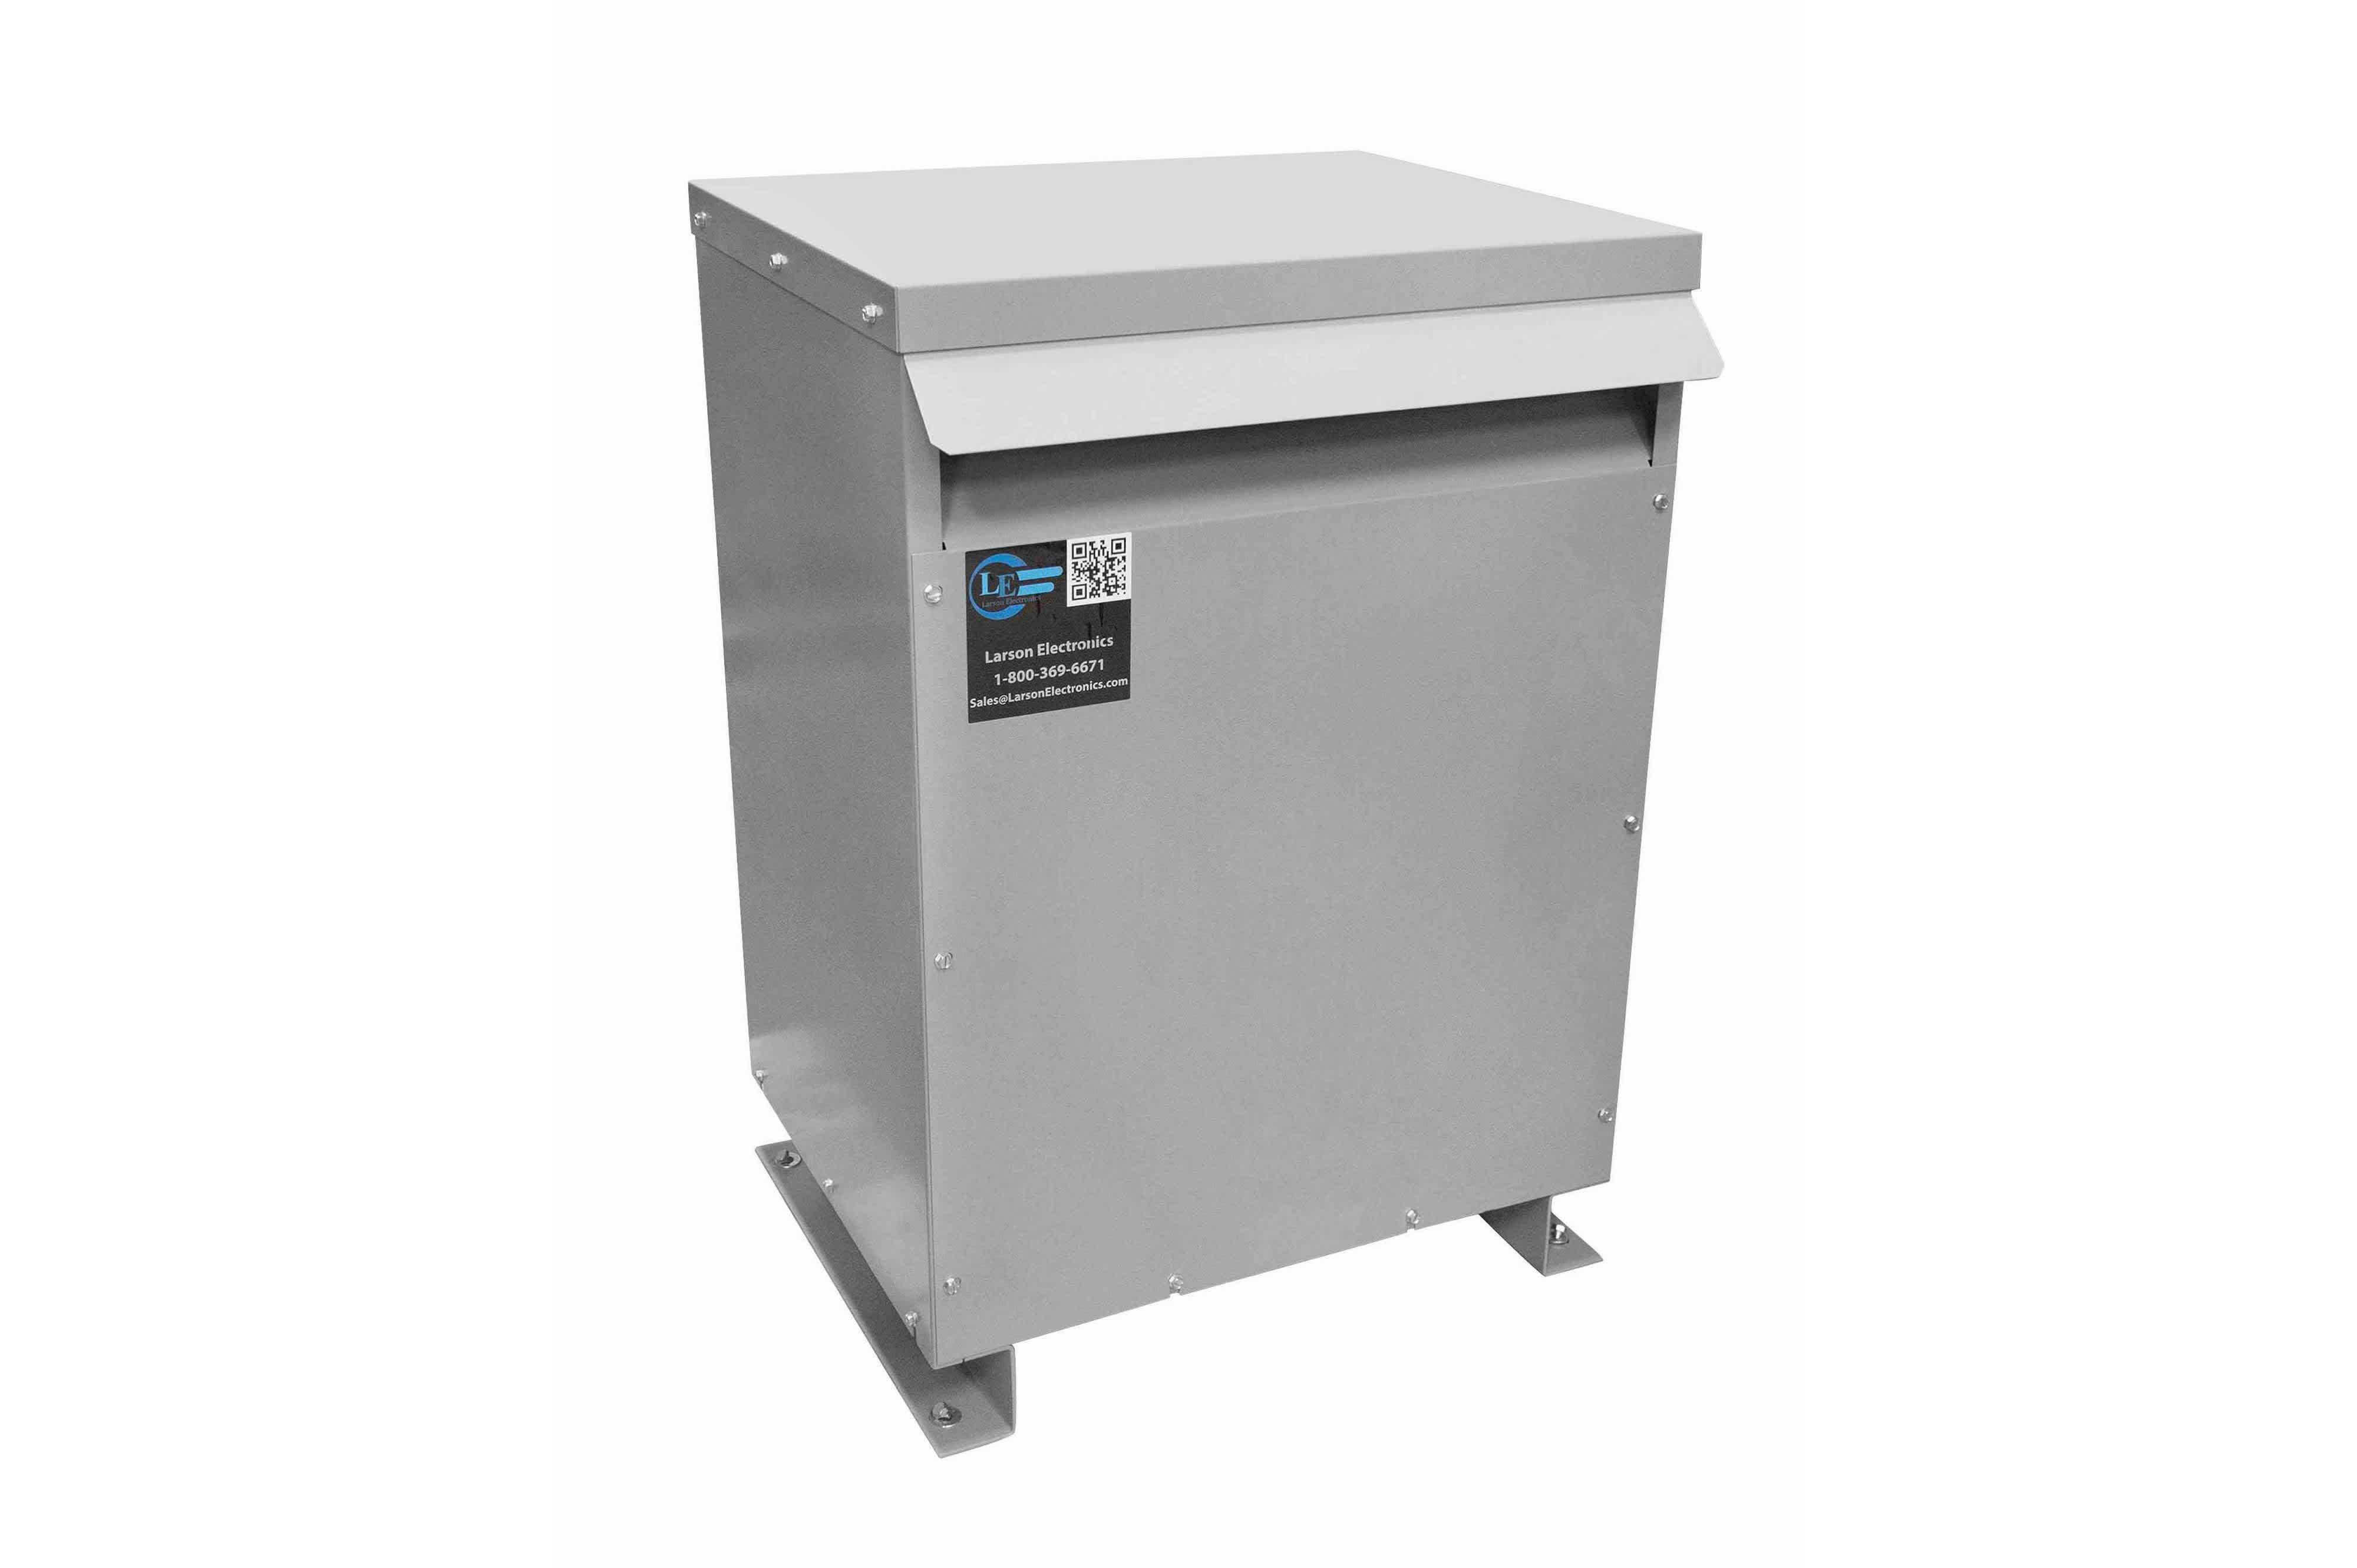 36 kVA 3PH Isolation Transformer, 400V Wye Primary, 208V Delta Secondary, N3R, Ventilated, 60 Hz